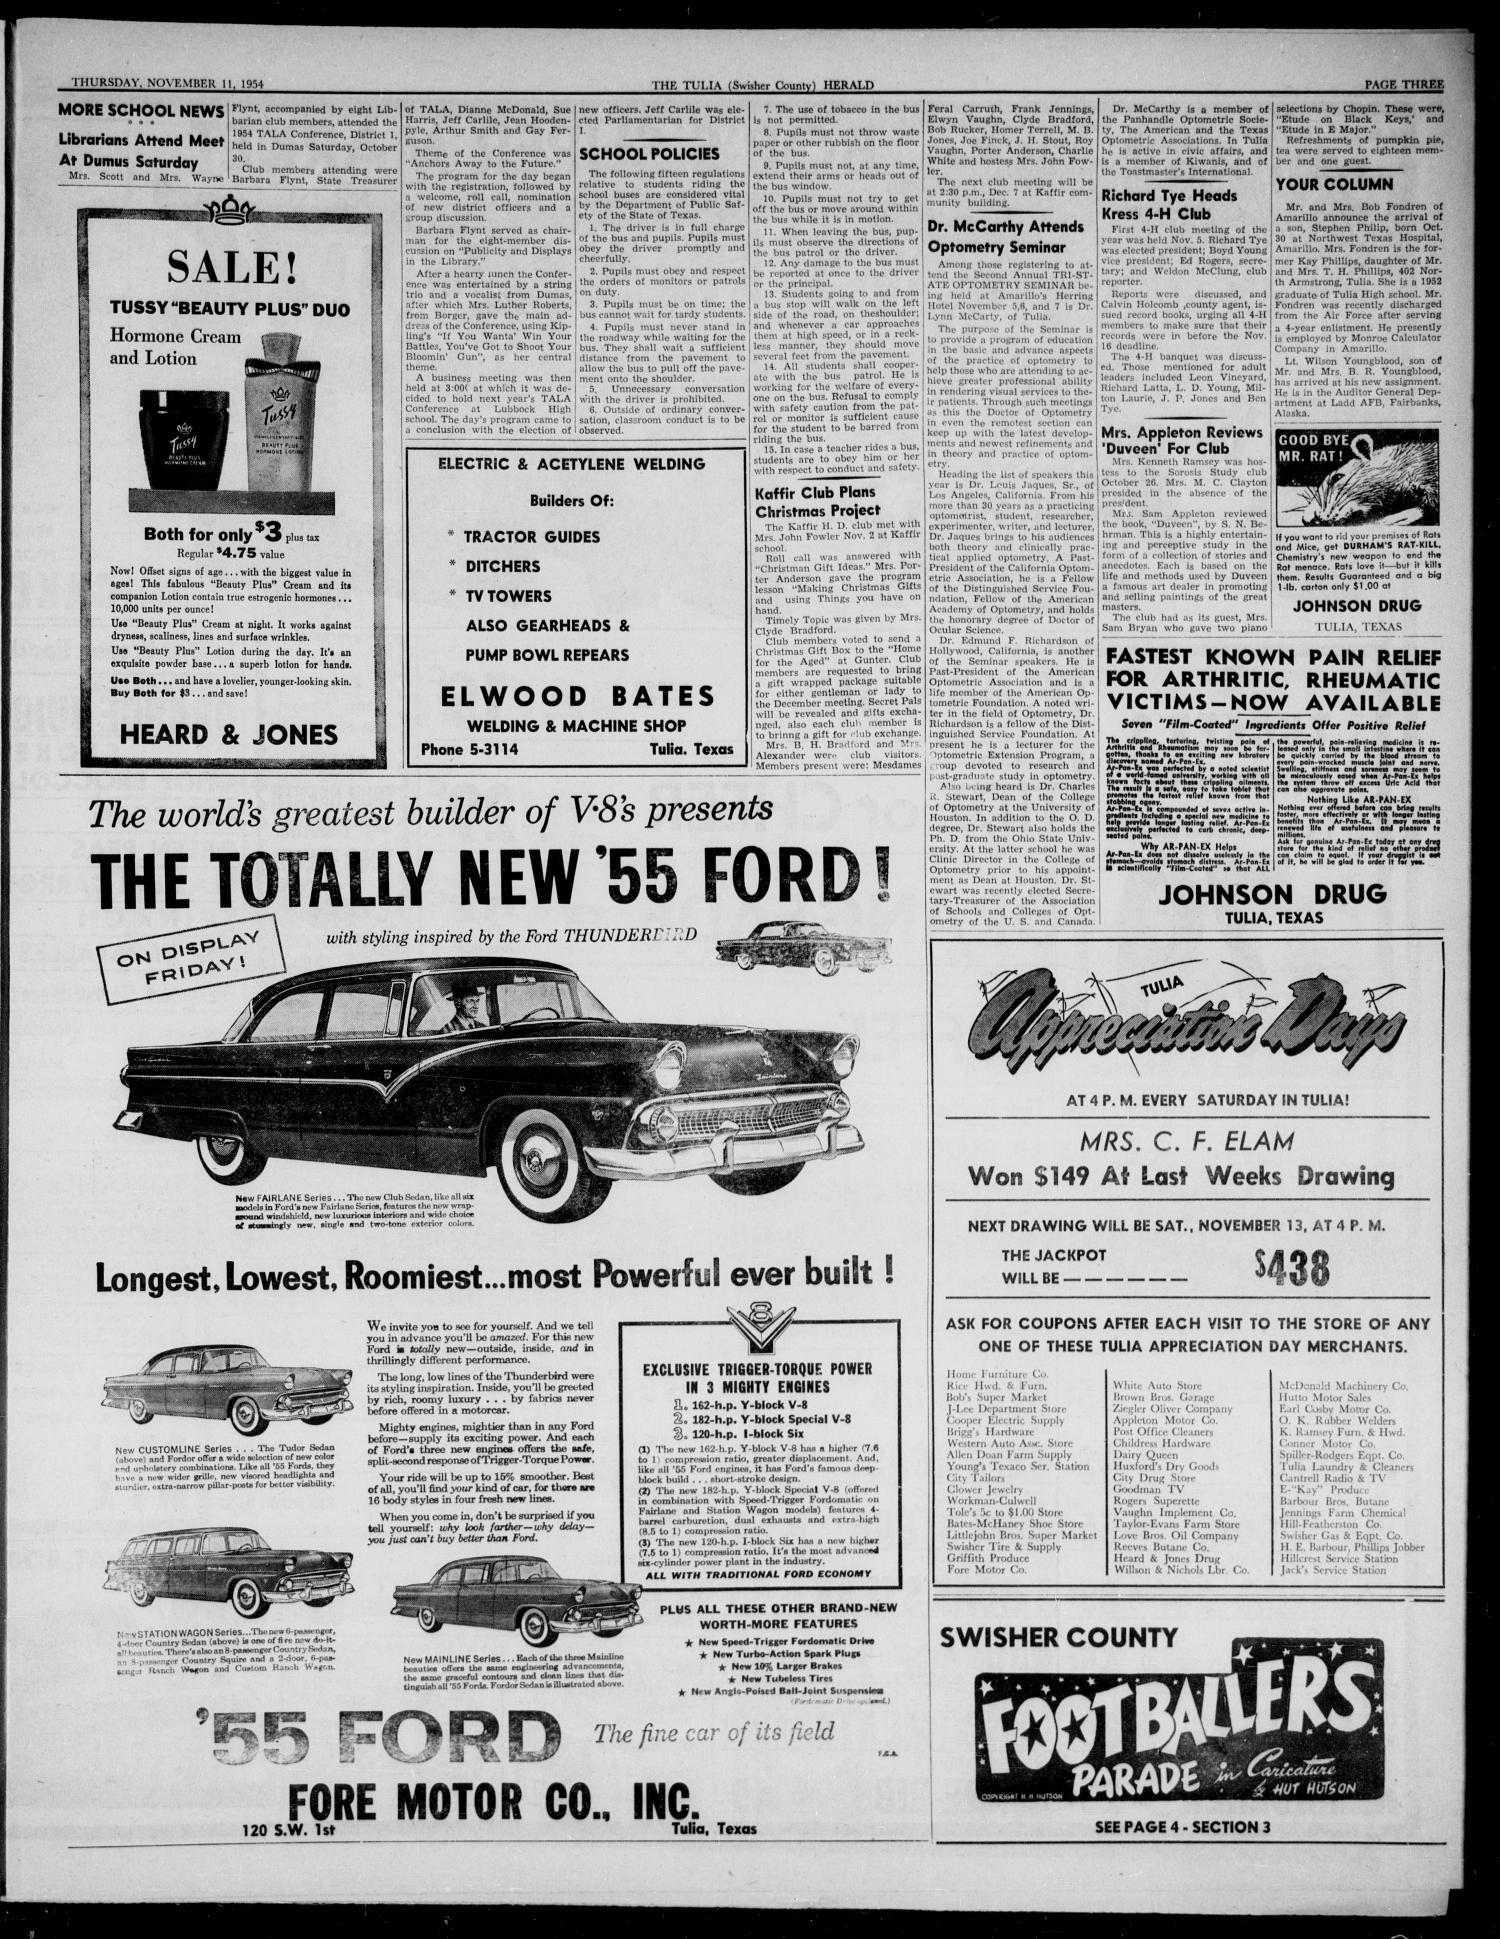 Ed Hicks Pre Owned >> Bates Motor Co - impremedia.net